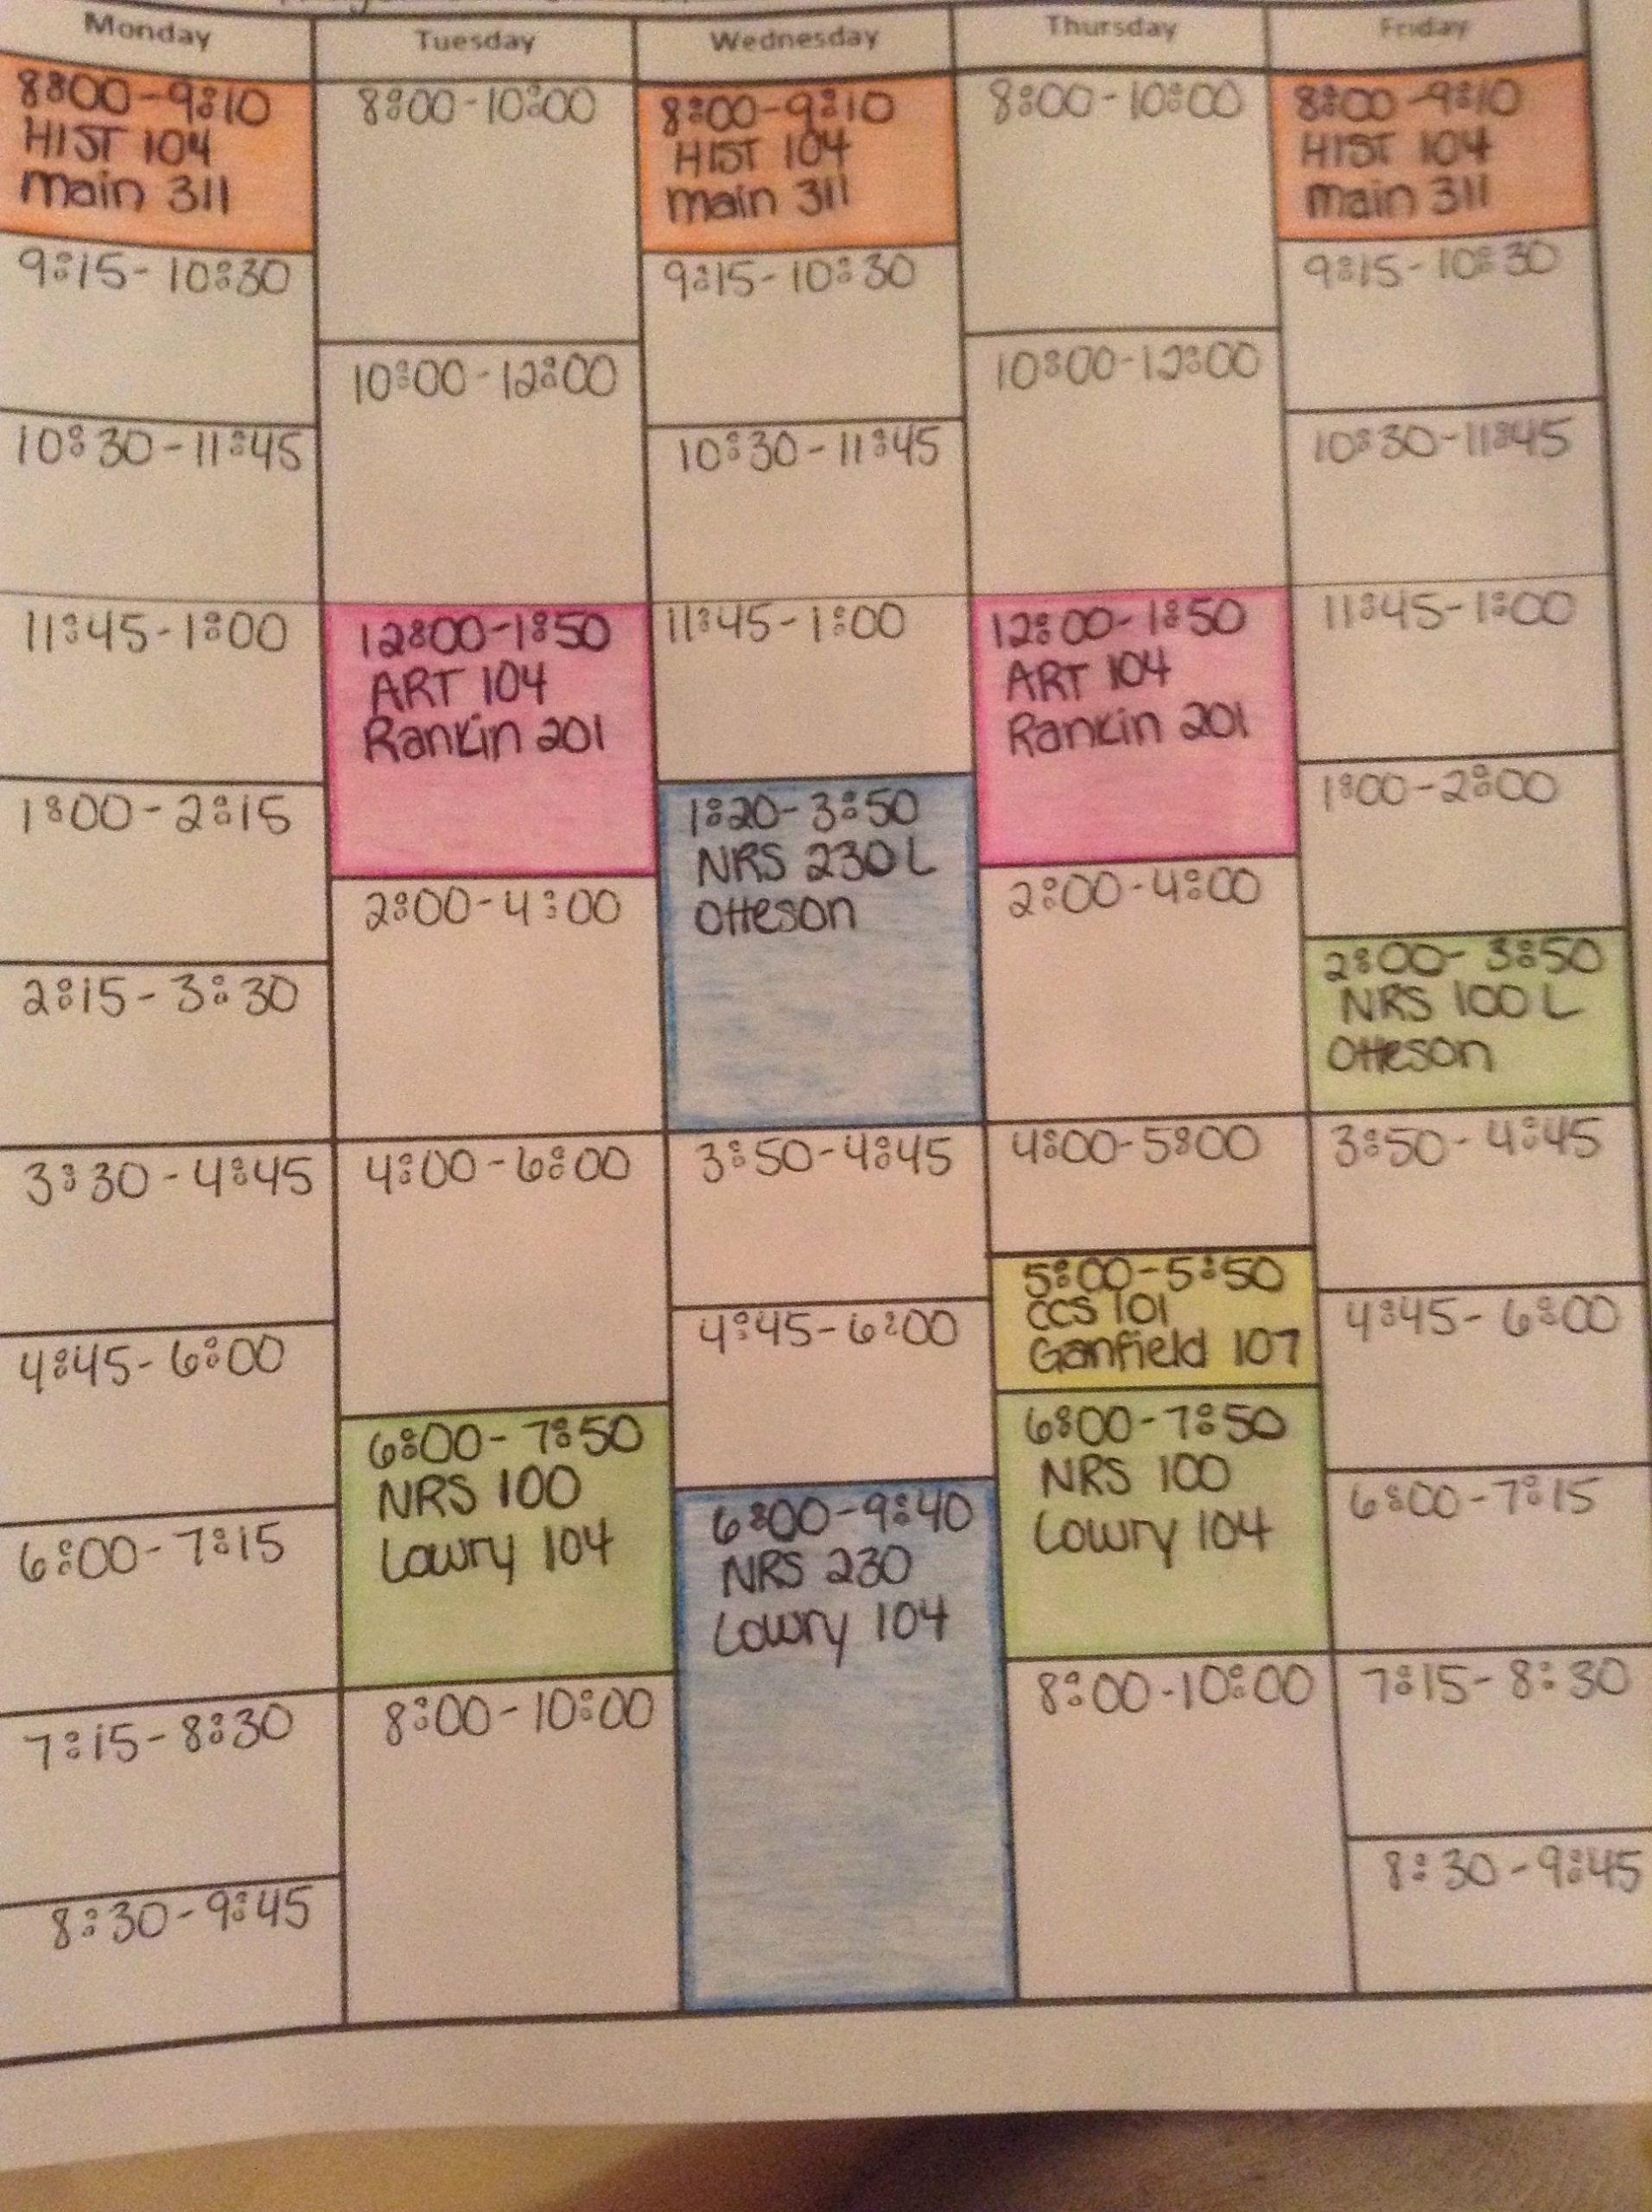 College Class Schedule Planner Fresh College organizer Planner – Free Printable Links